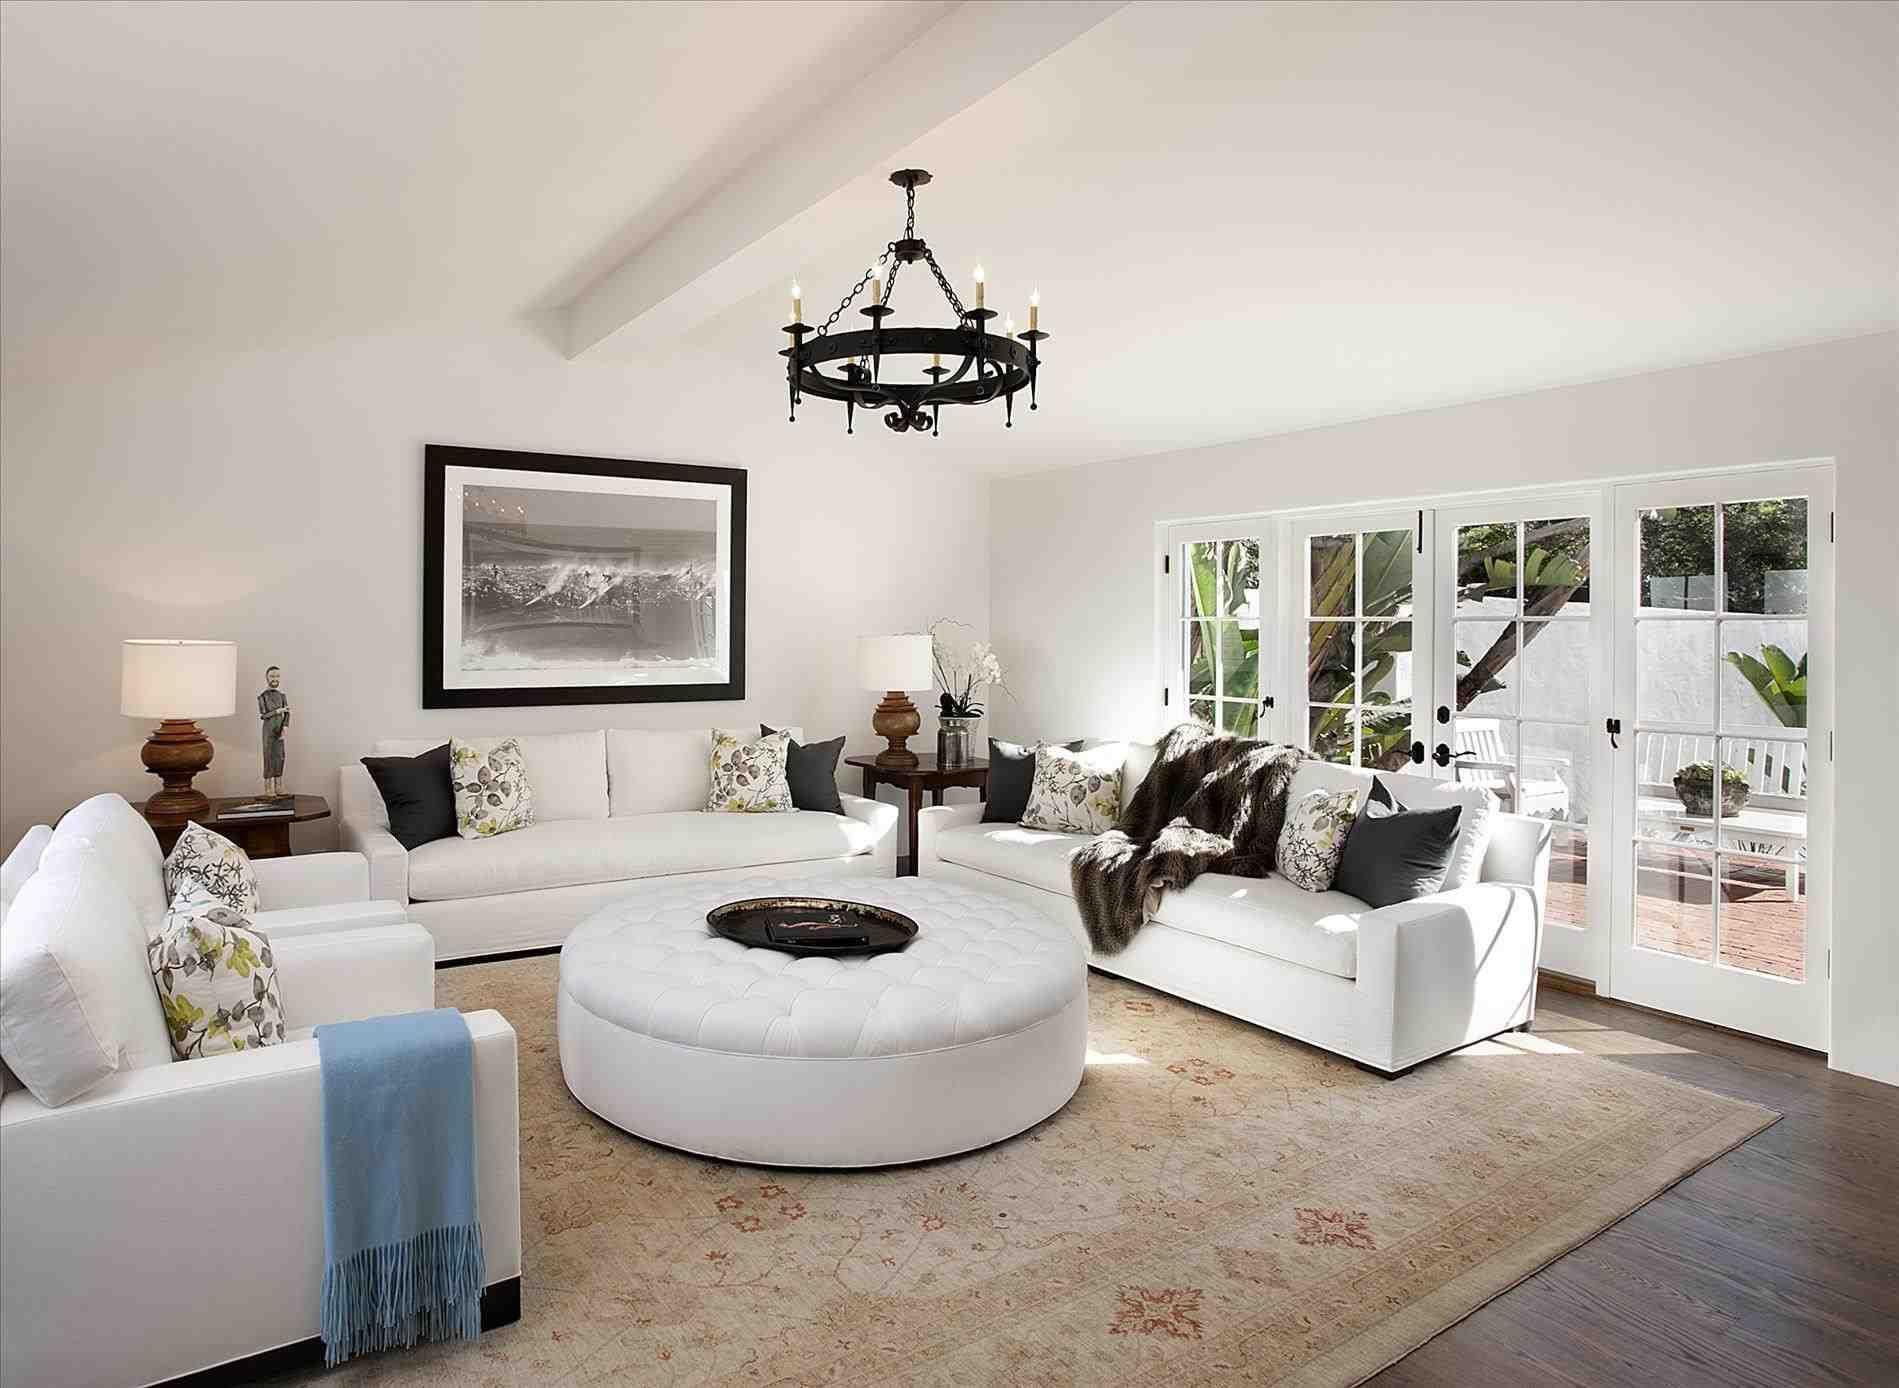 Spanish Style Home Decor Interior in 2018 | Spanish style, Spanish ...